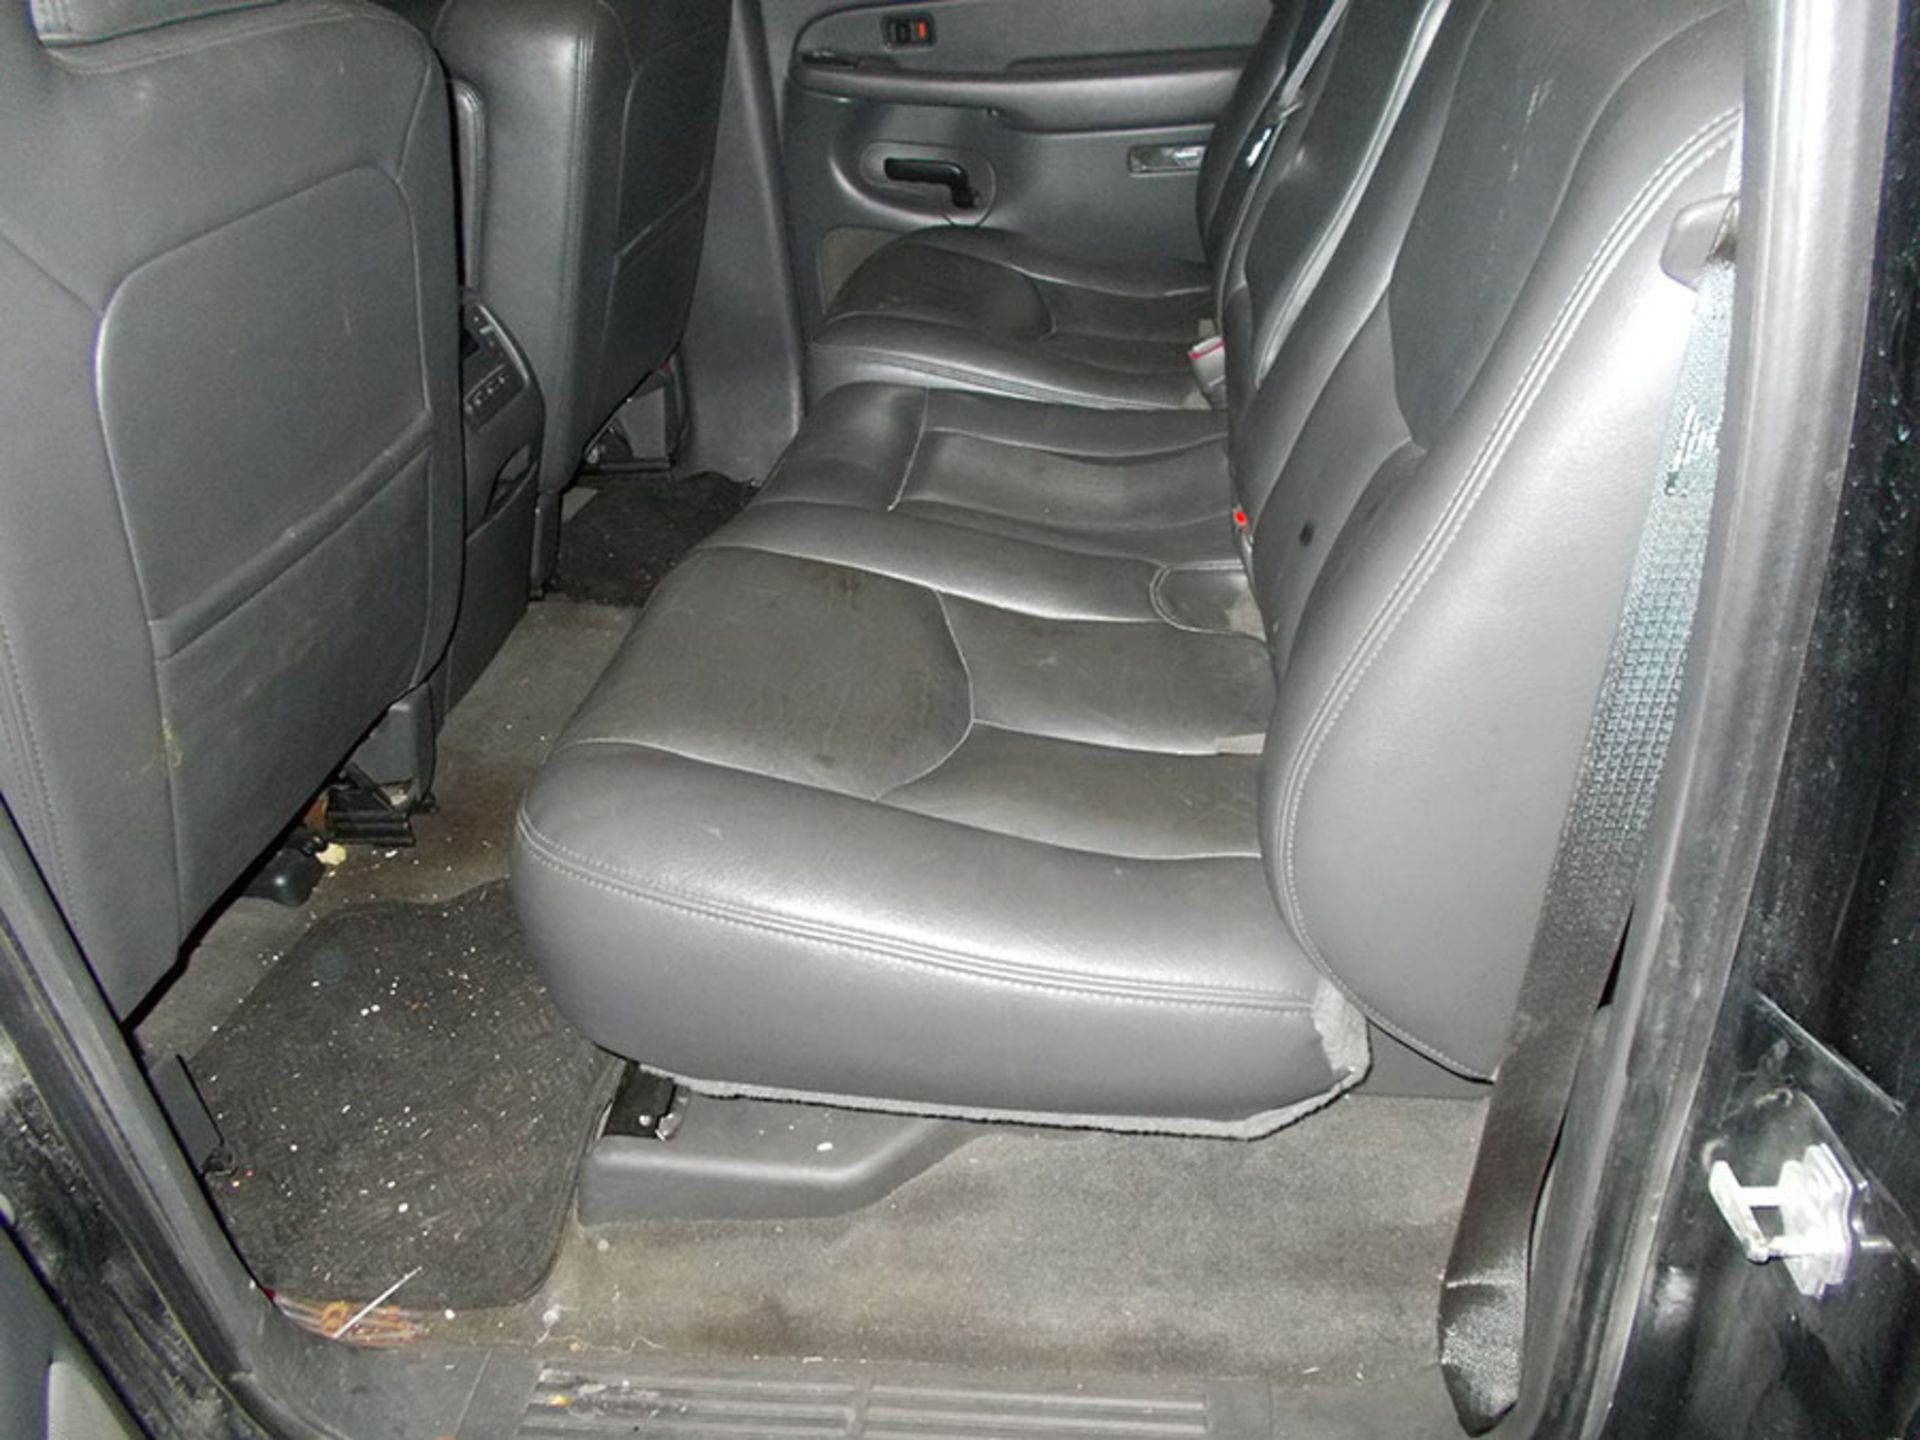 Lot 798 - 2005 GMC MODEL Z71 OFF ROAD 4-WHEEL DRIVE TRUCK; CREW CAB, SLT, 195,679 MILES, 6' BED, VIN